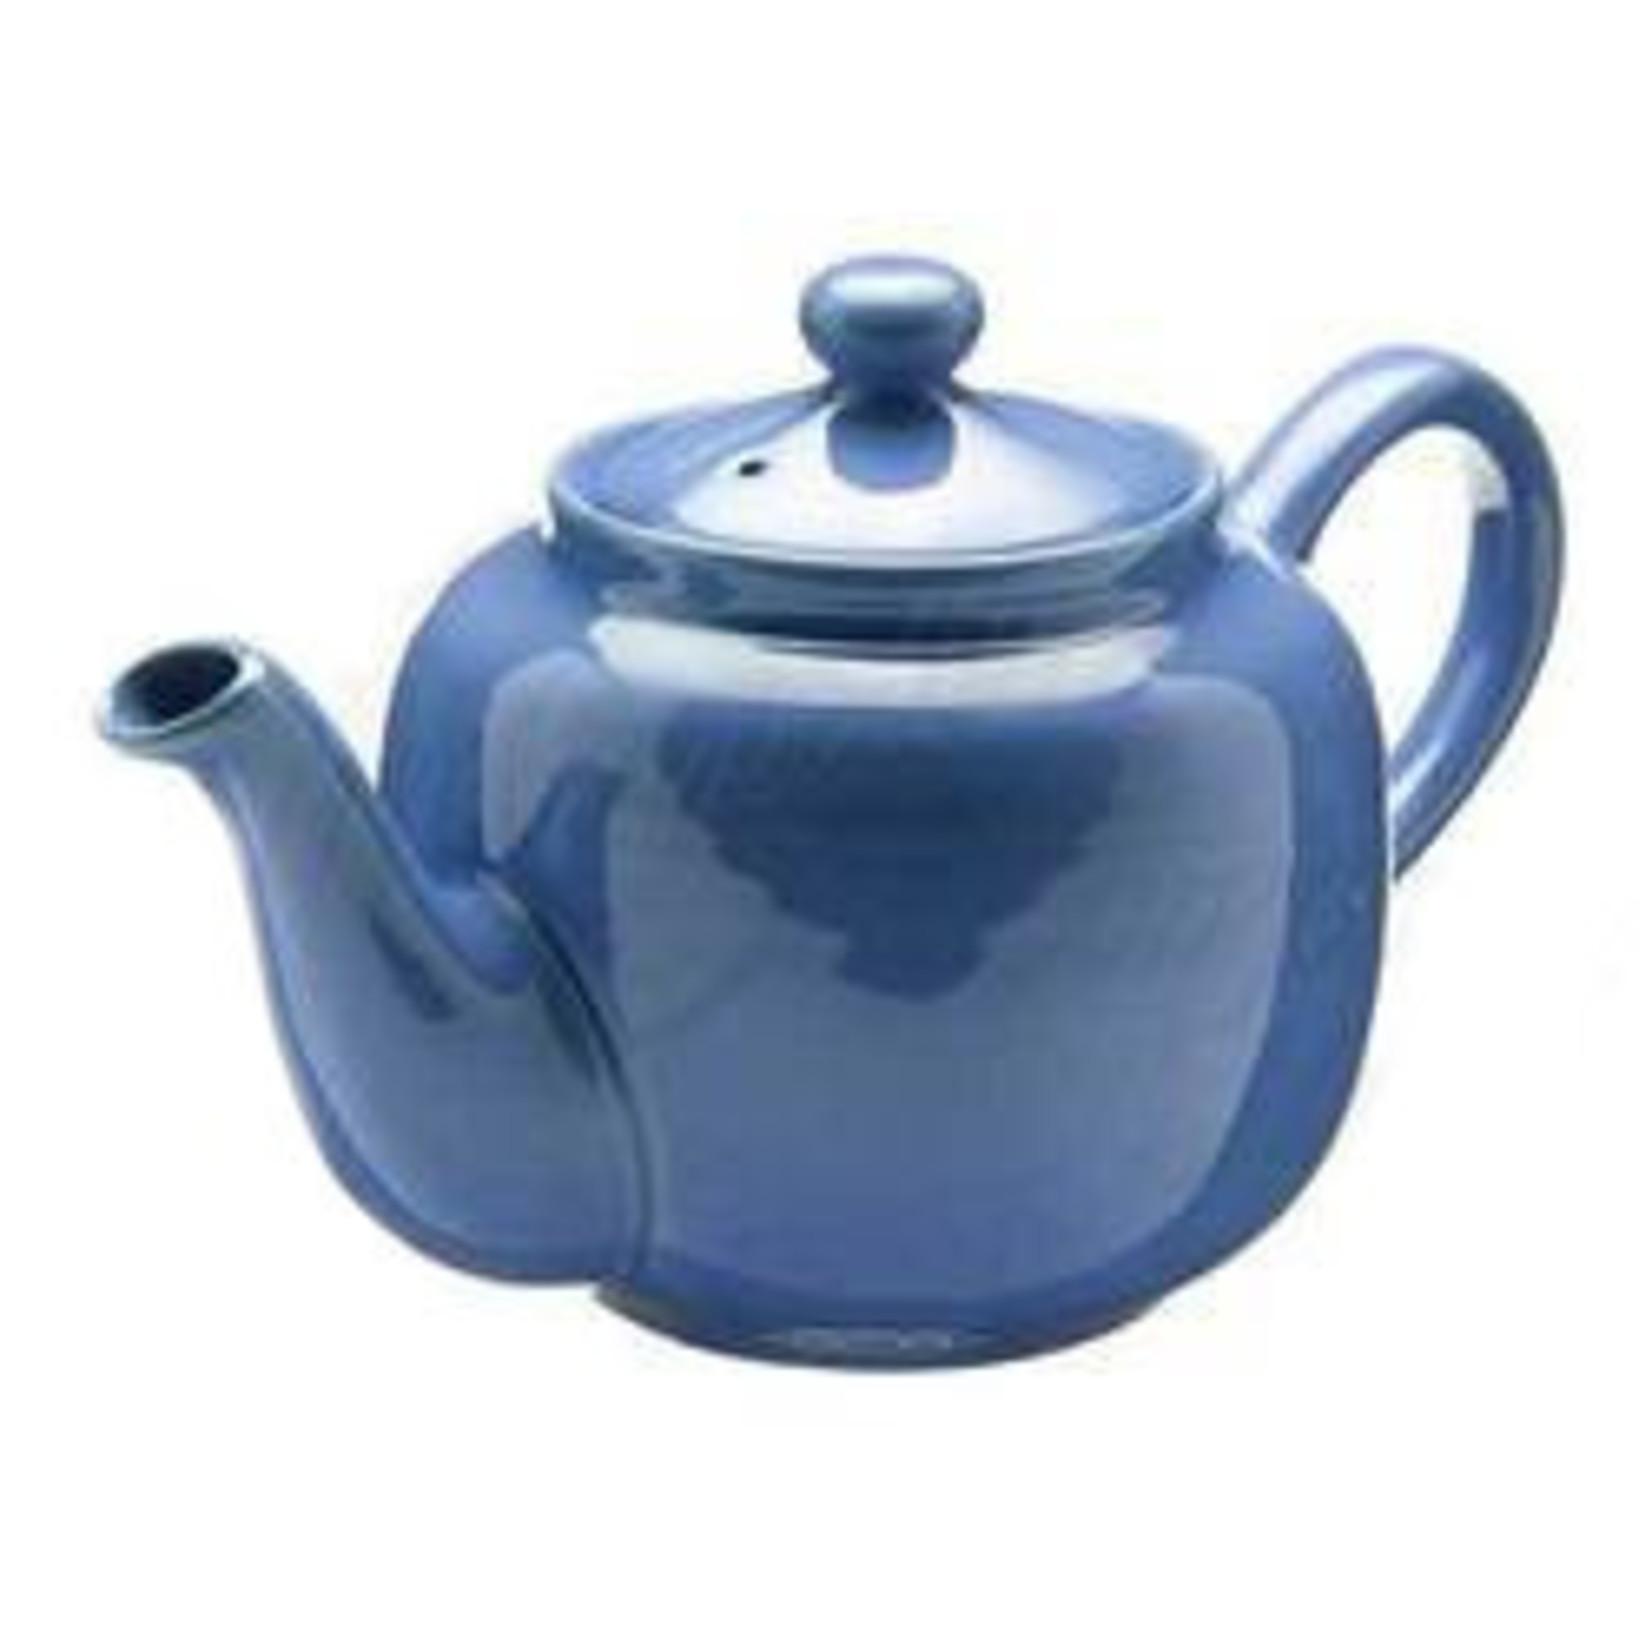 BrewBakers Sherwood Tea Pot 3 Cup Blue